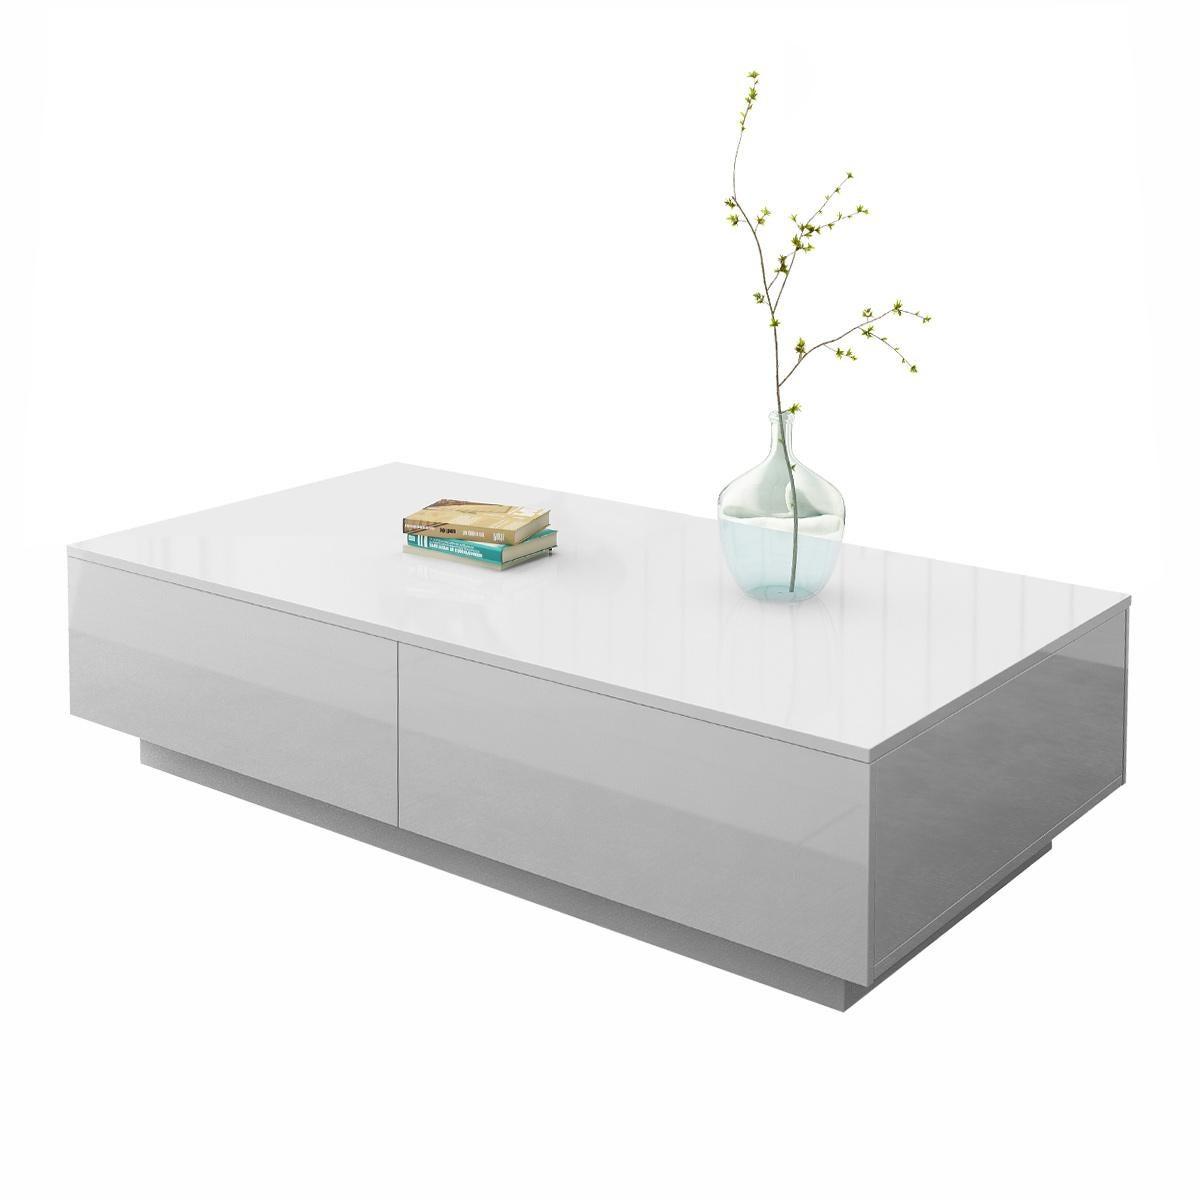 modern coffee table 4 drawer storage shelf high gloss wood living room furniture white